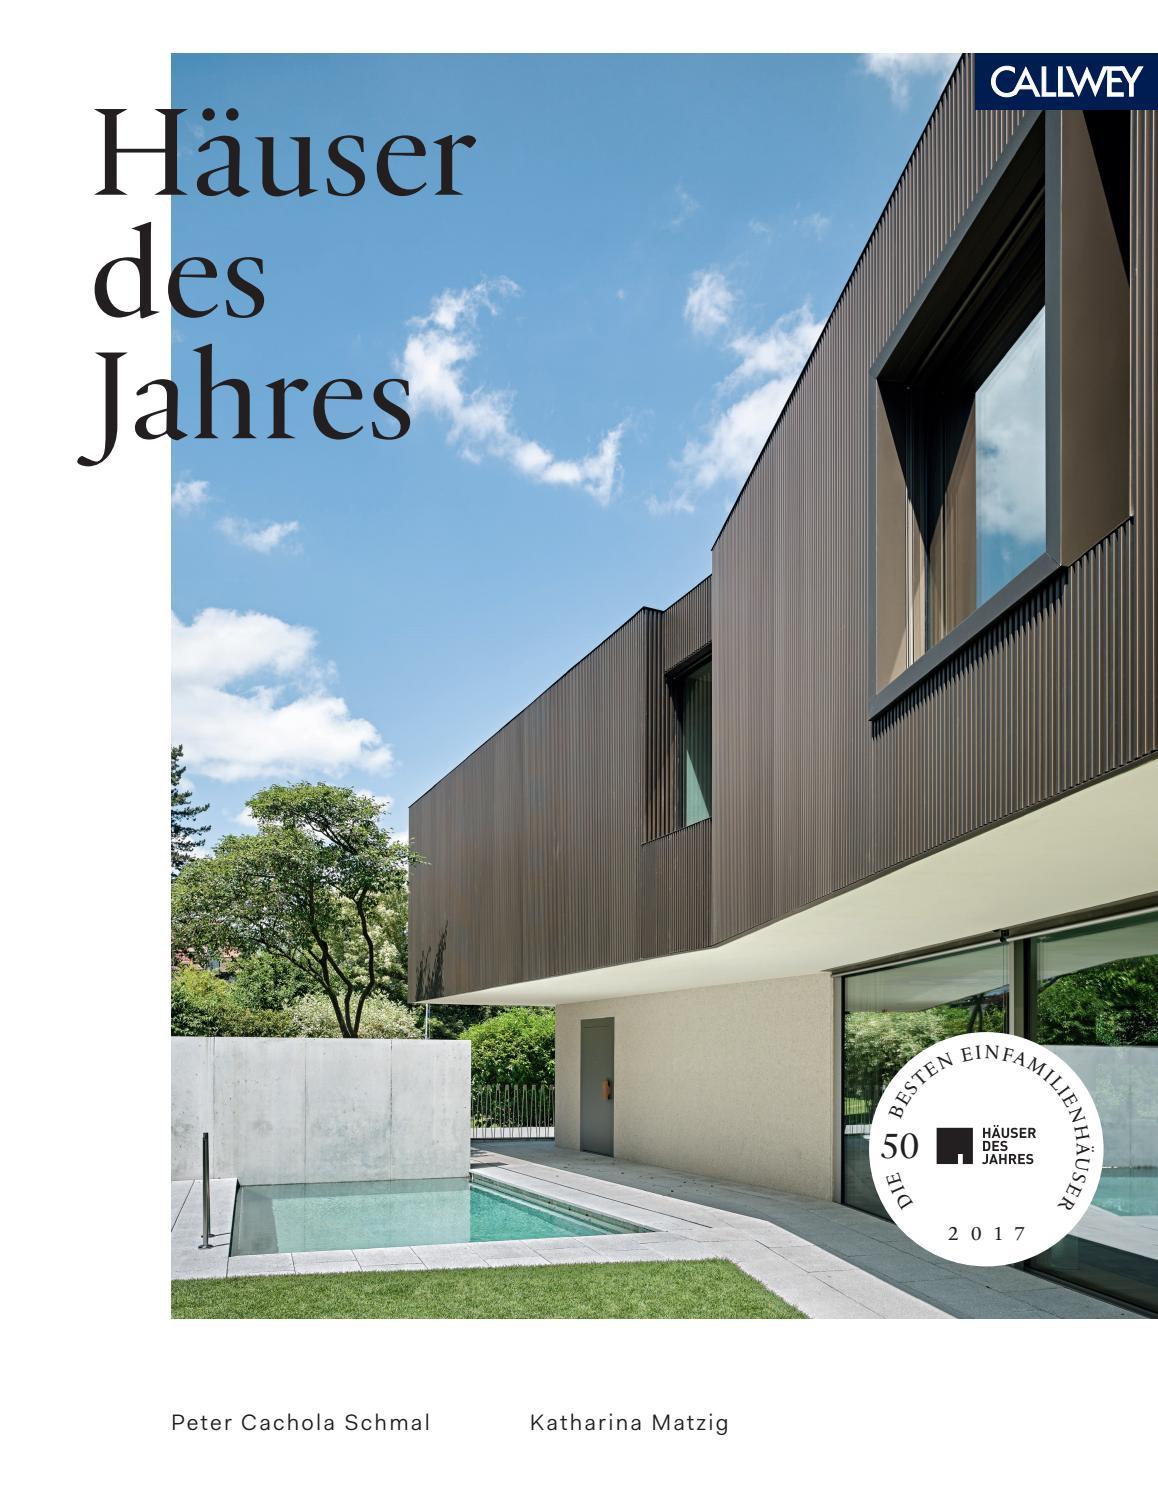 Häuser des Jahres 2017 by Georg D.W. Callwey GmbH & Co. KG - issuu